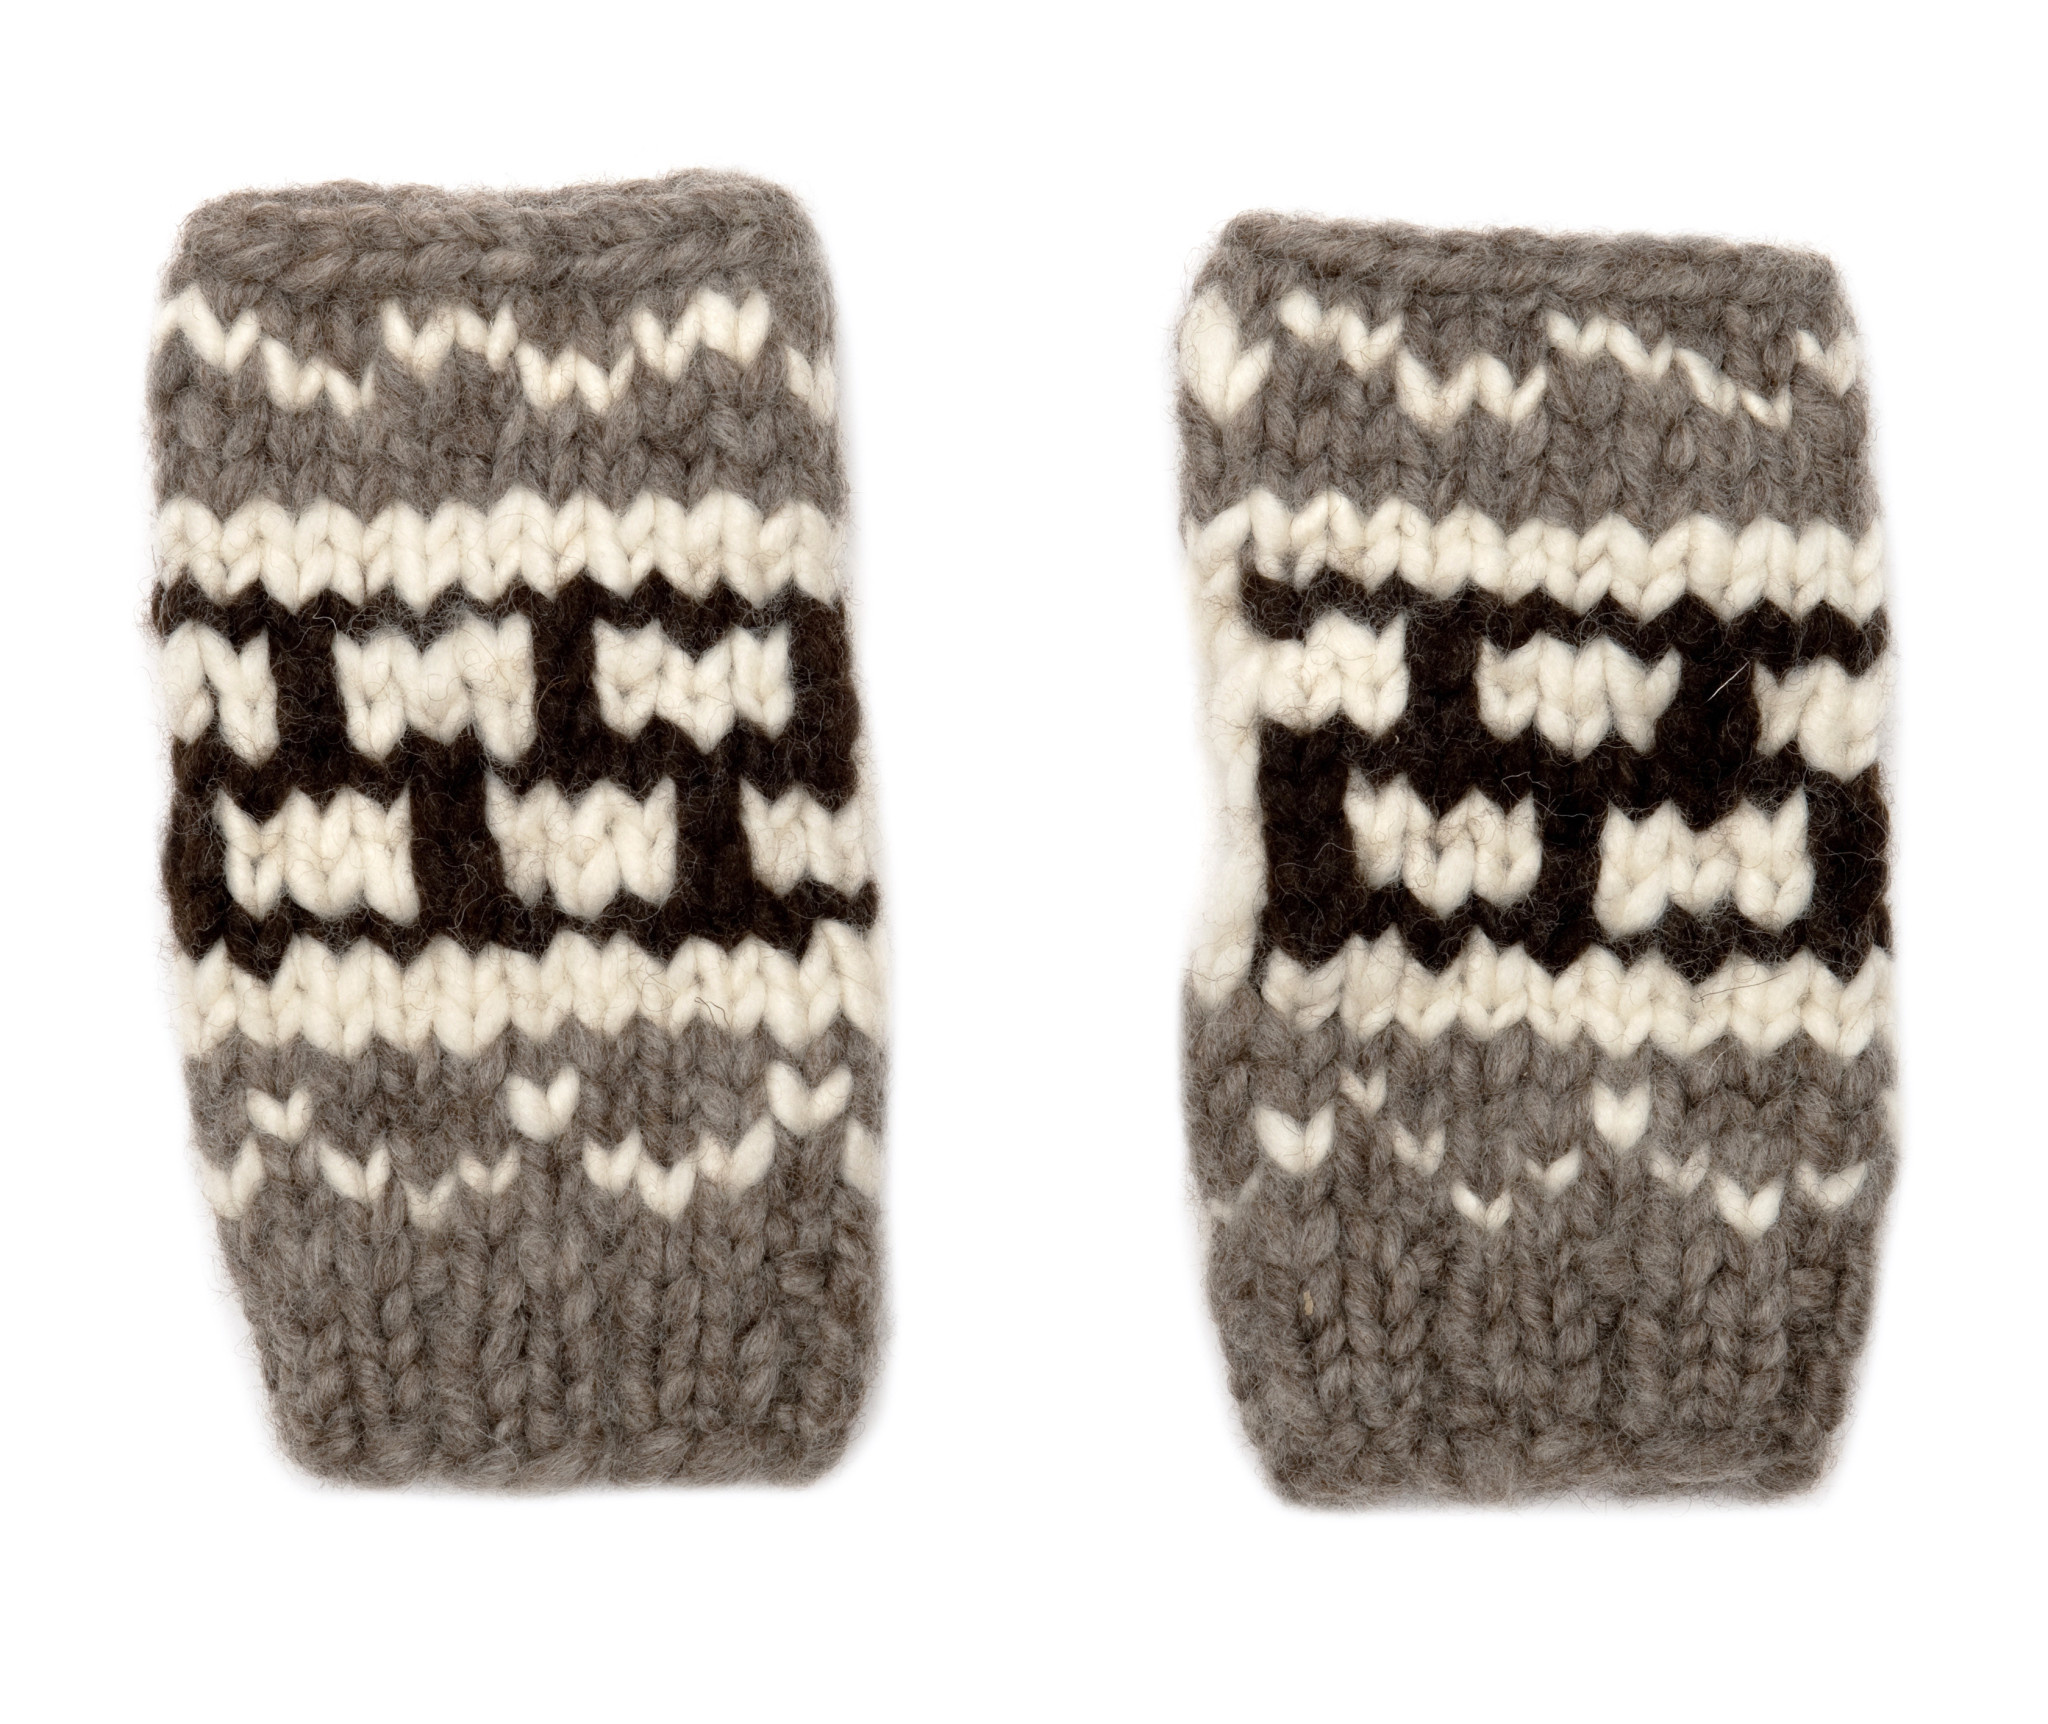 Short Cowichan Fingerless Gloves Mitts